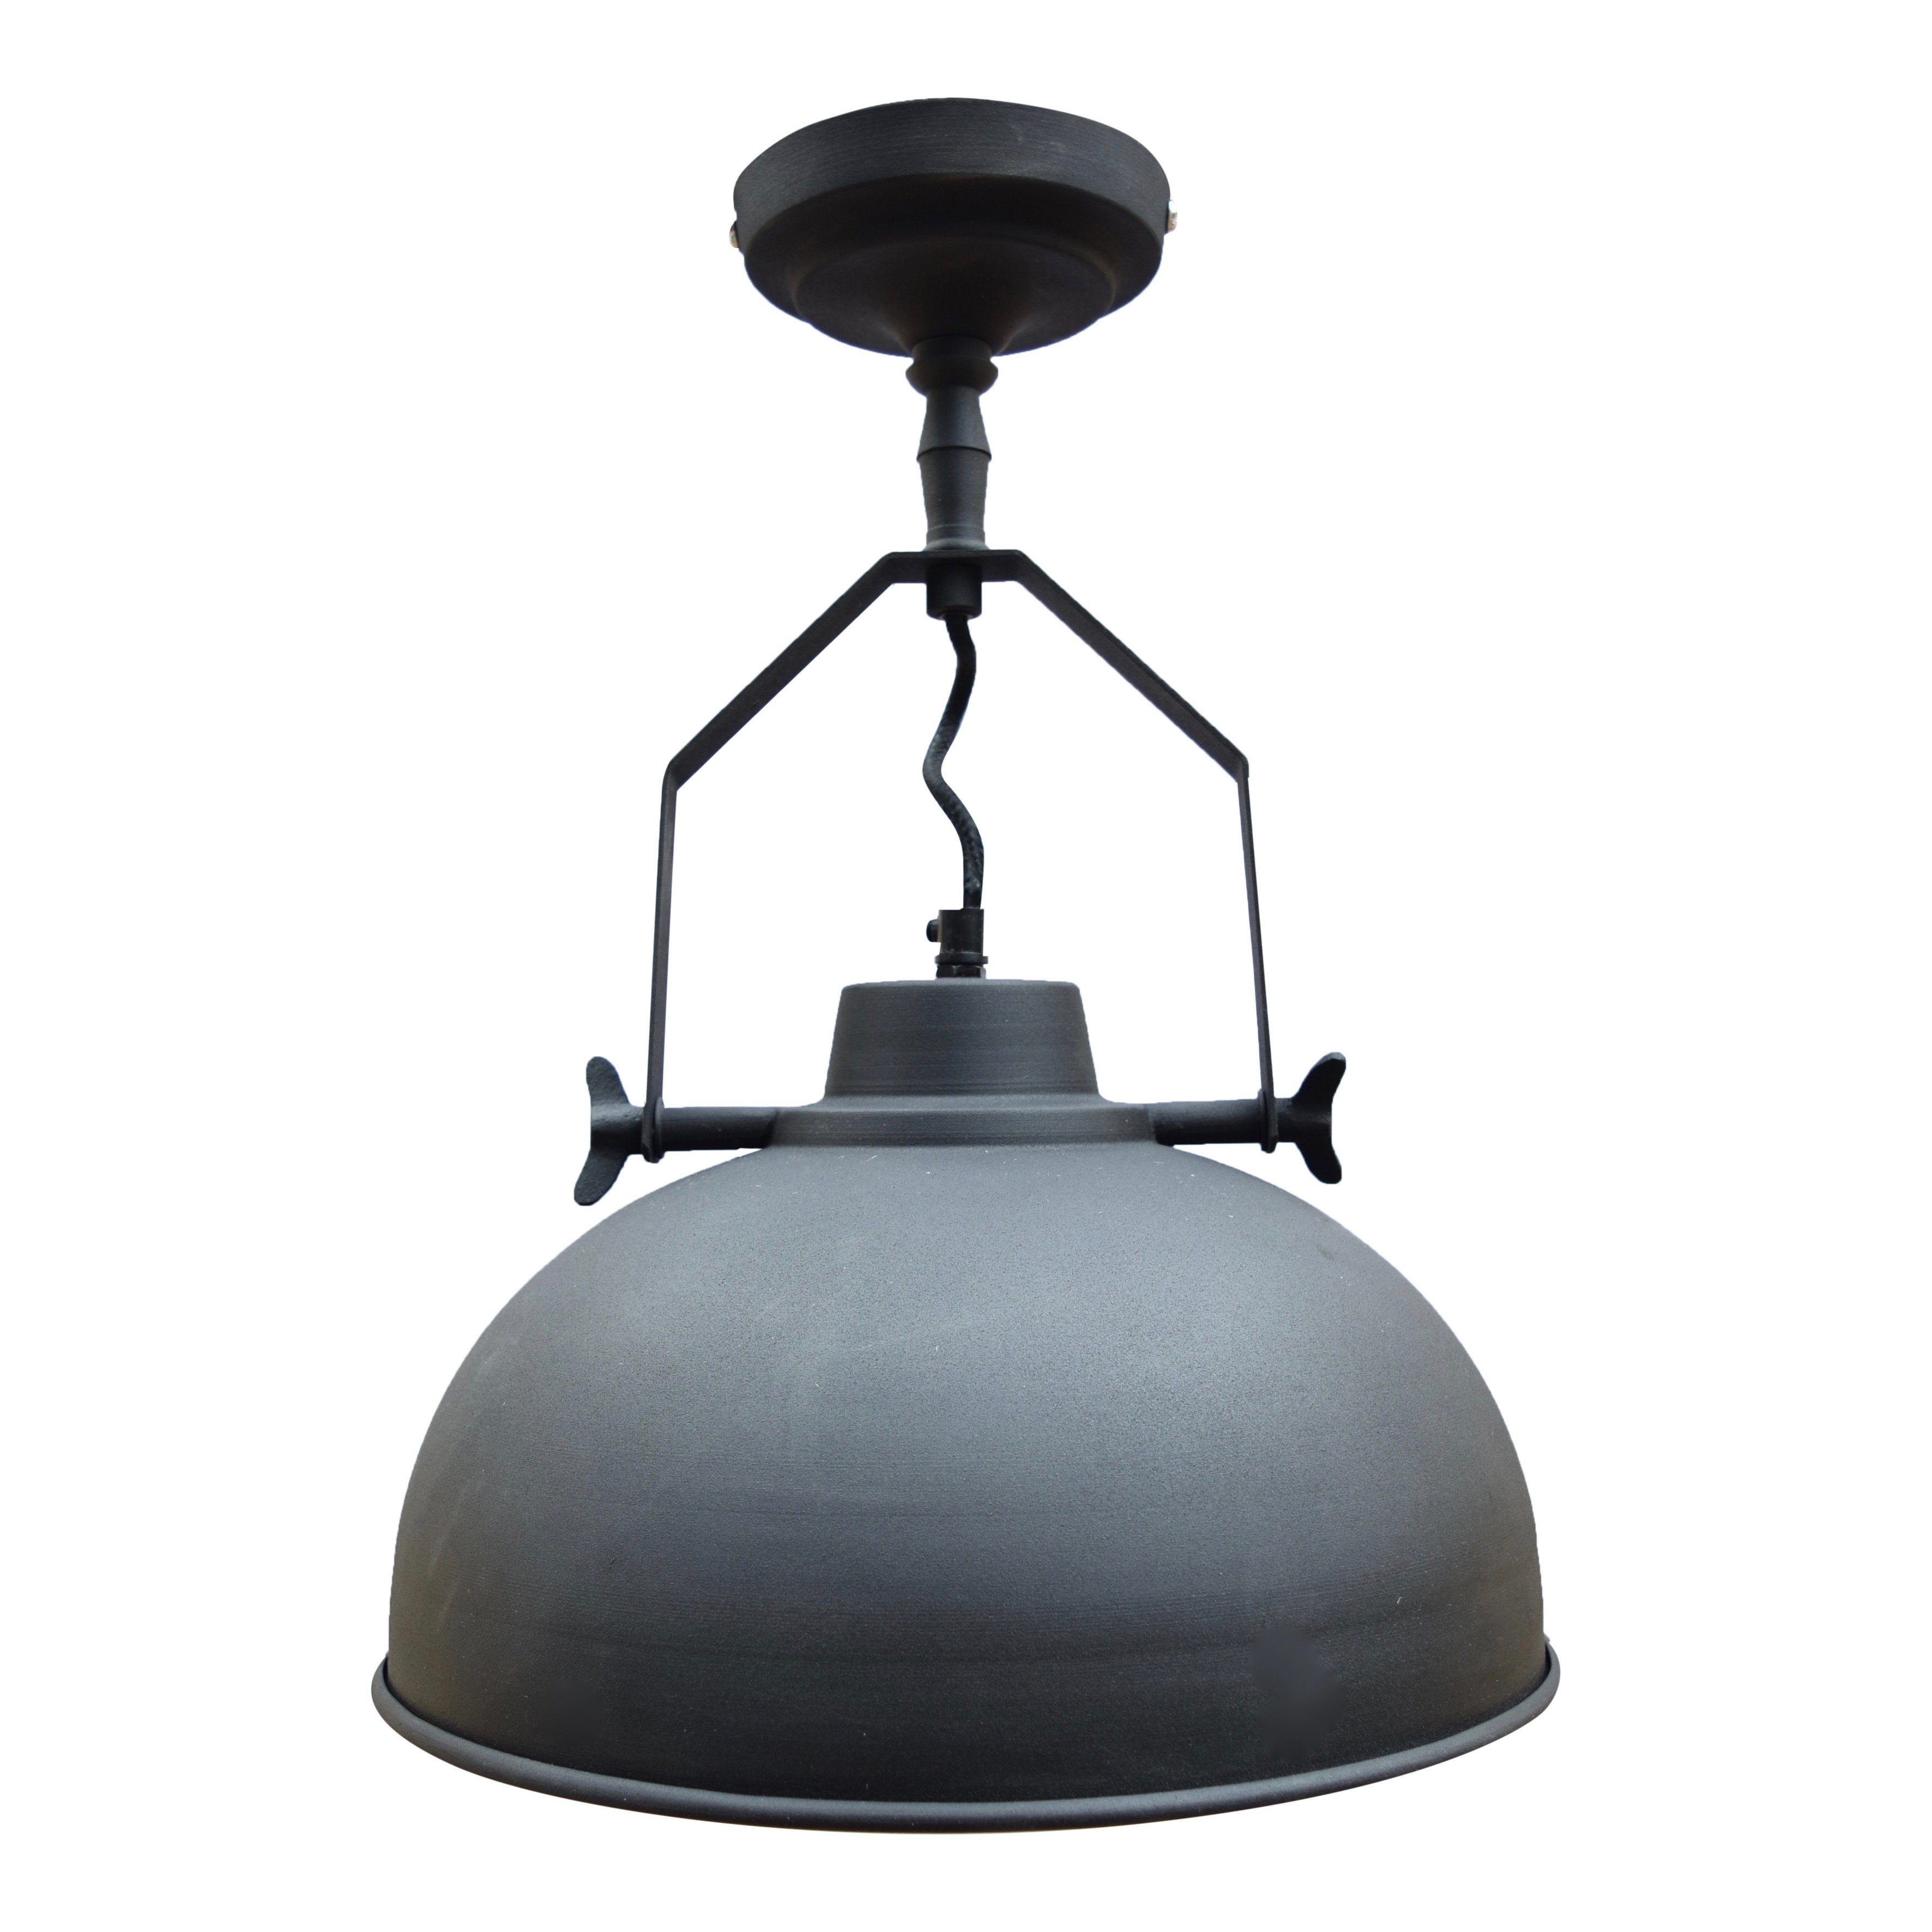 Urban Interiors Hanglamp industrieel Raz Ur. AI-WL-14-VB-PL